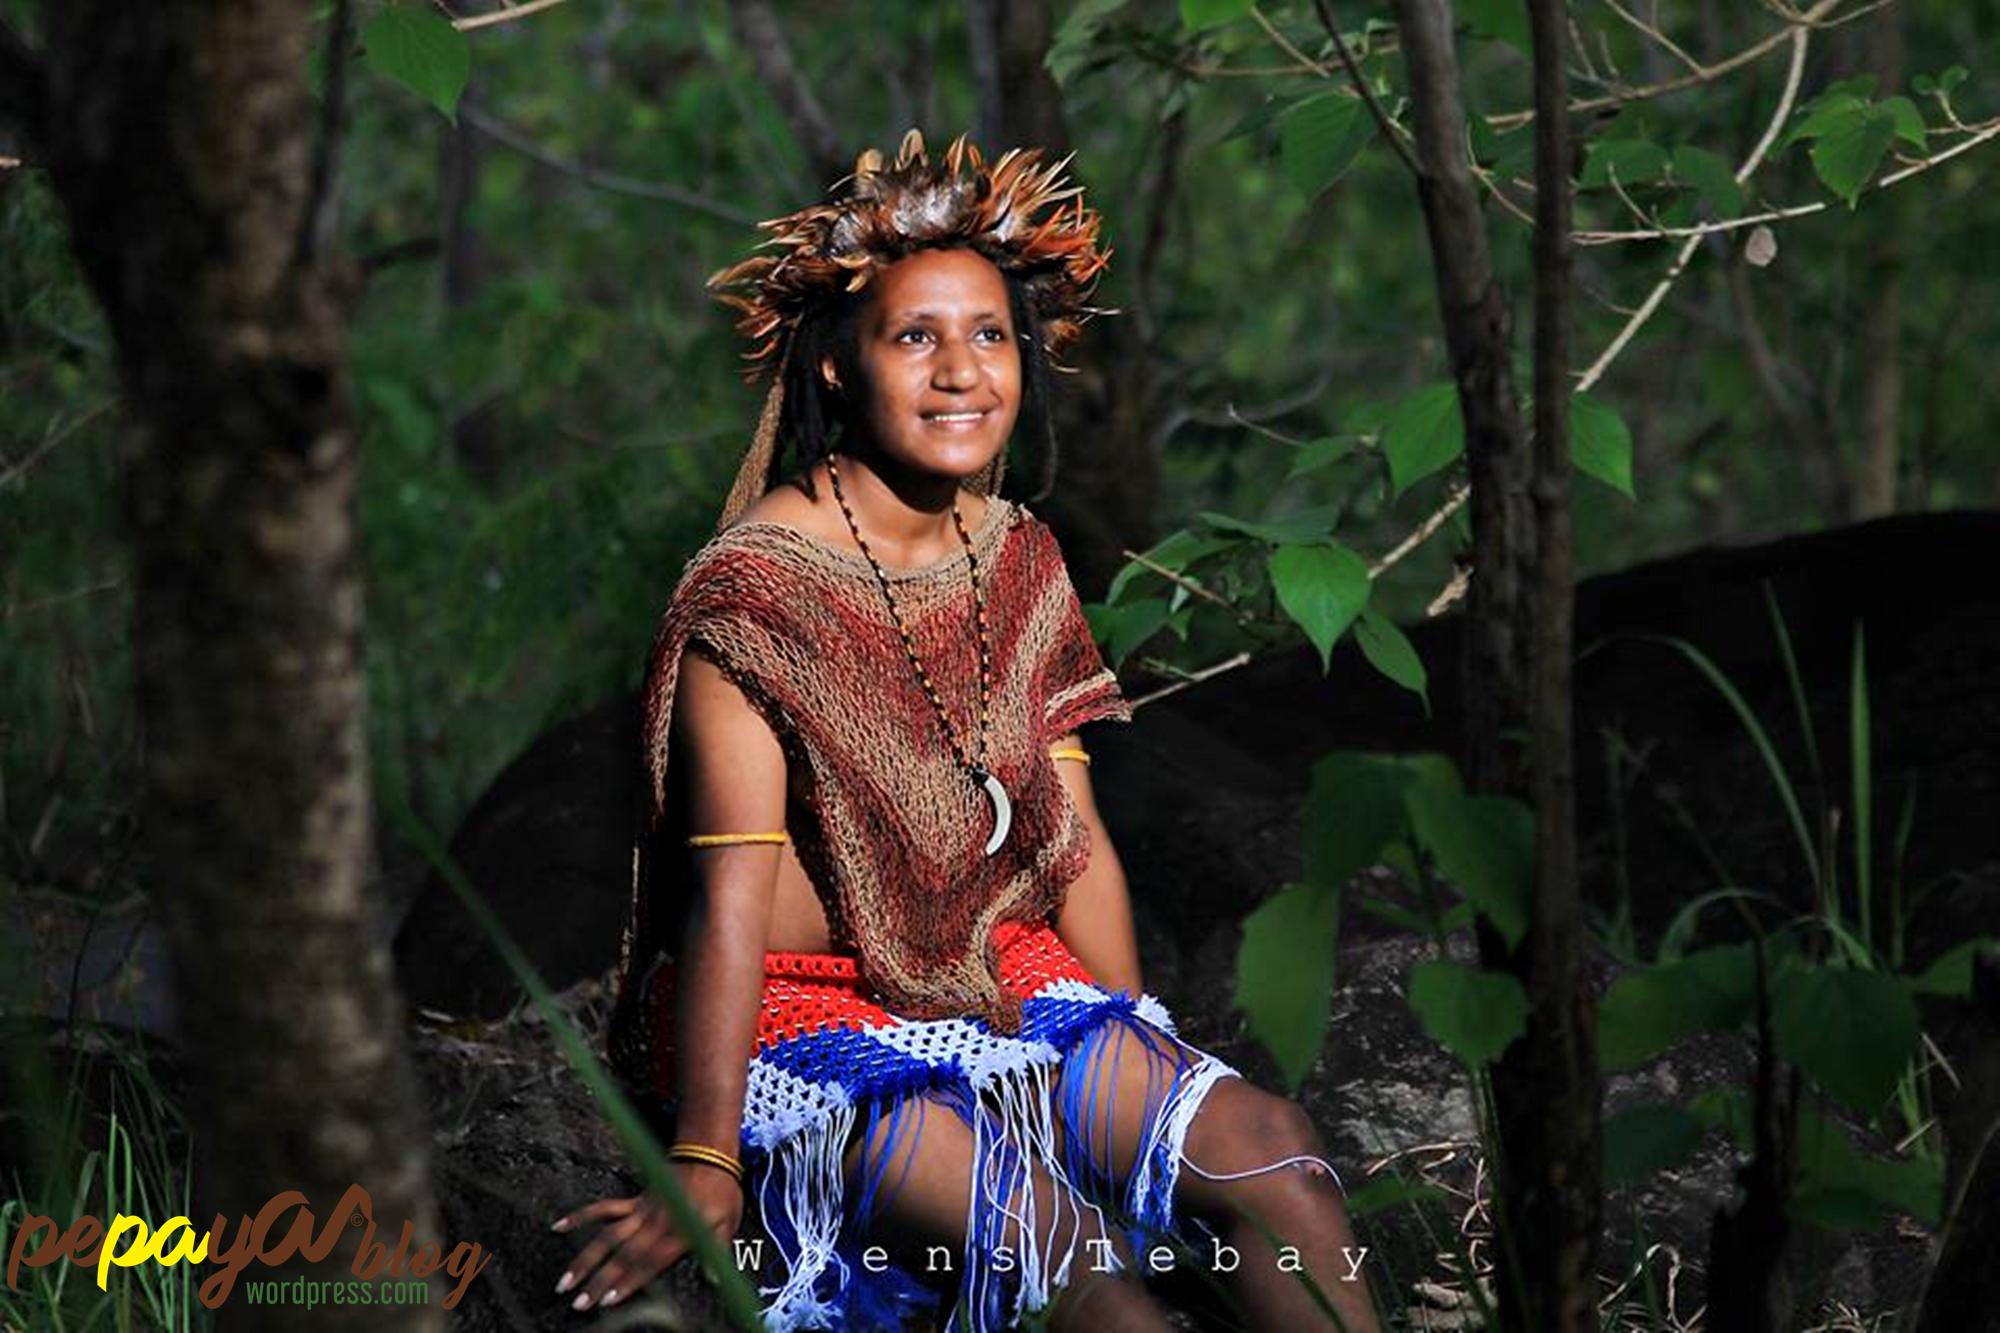 Pakaian Adat Perempuan Papua